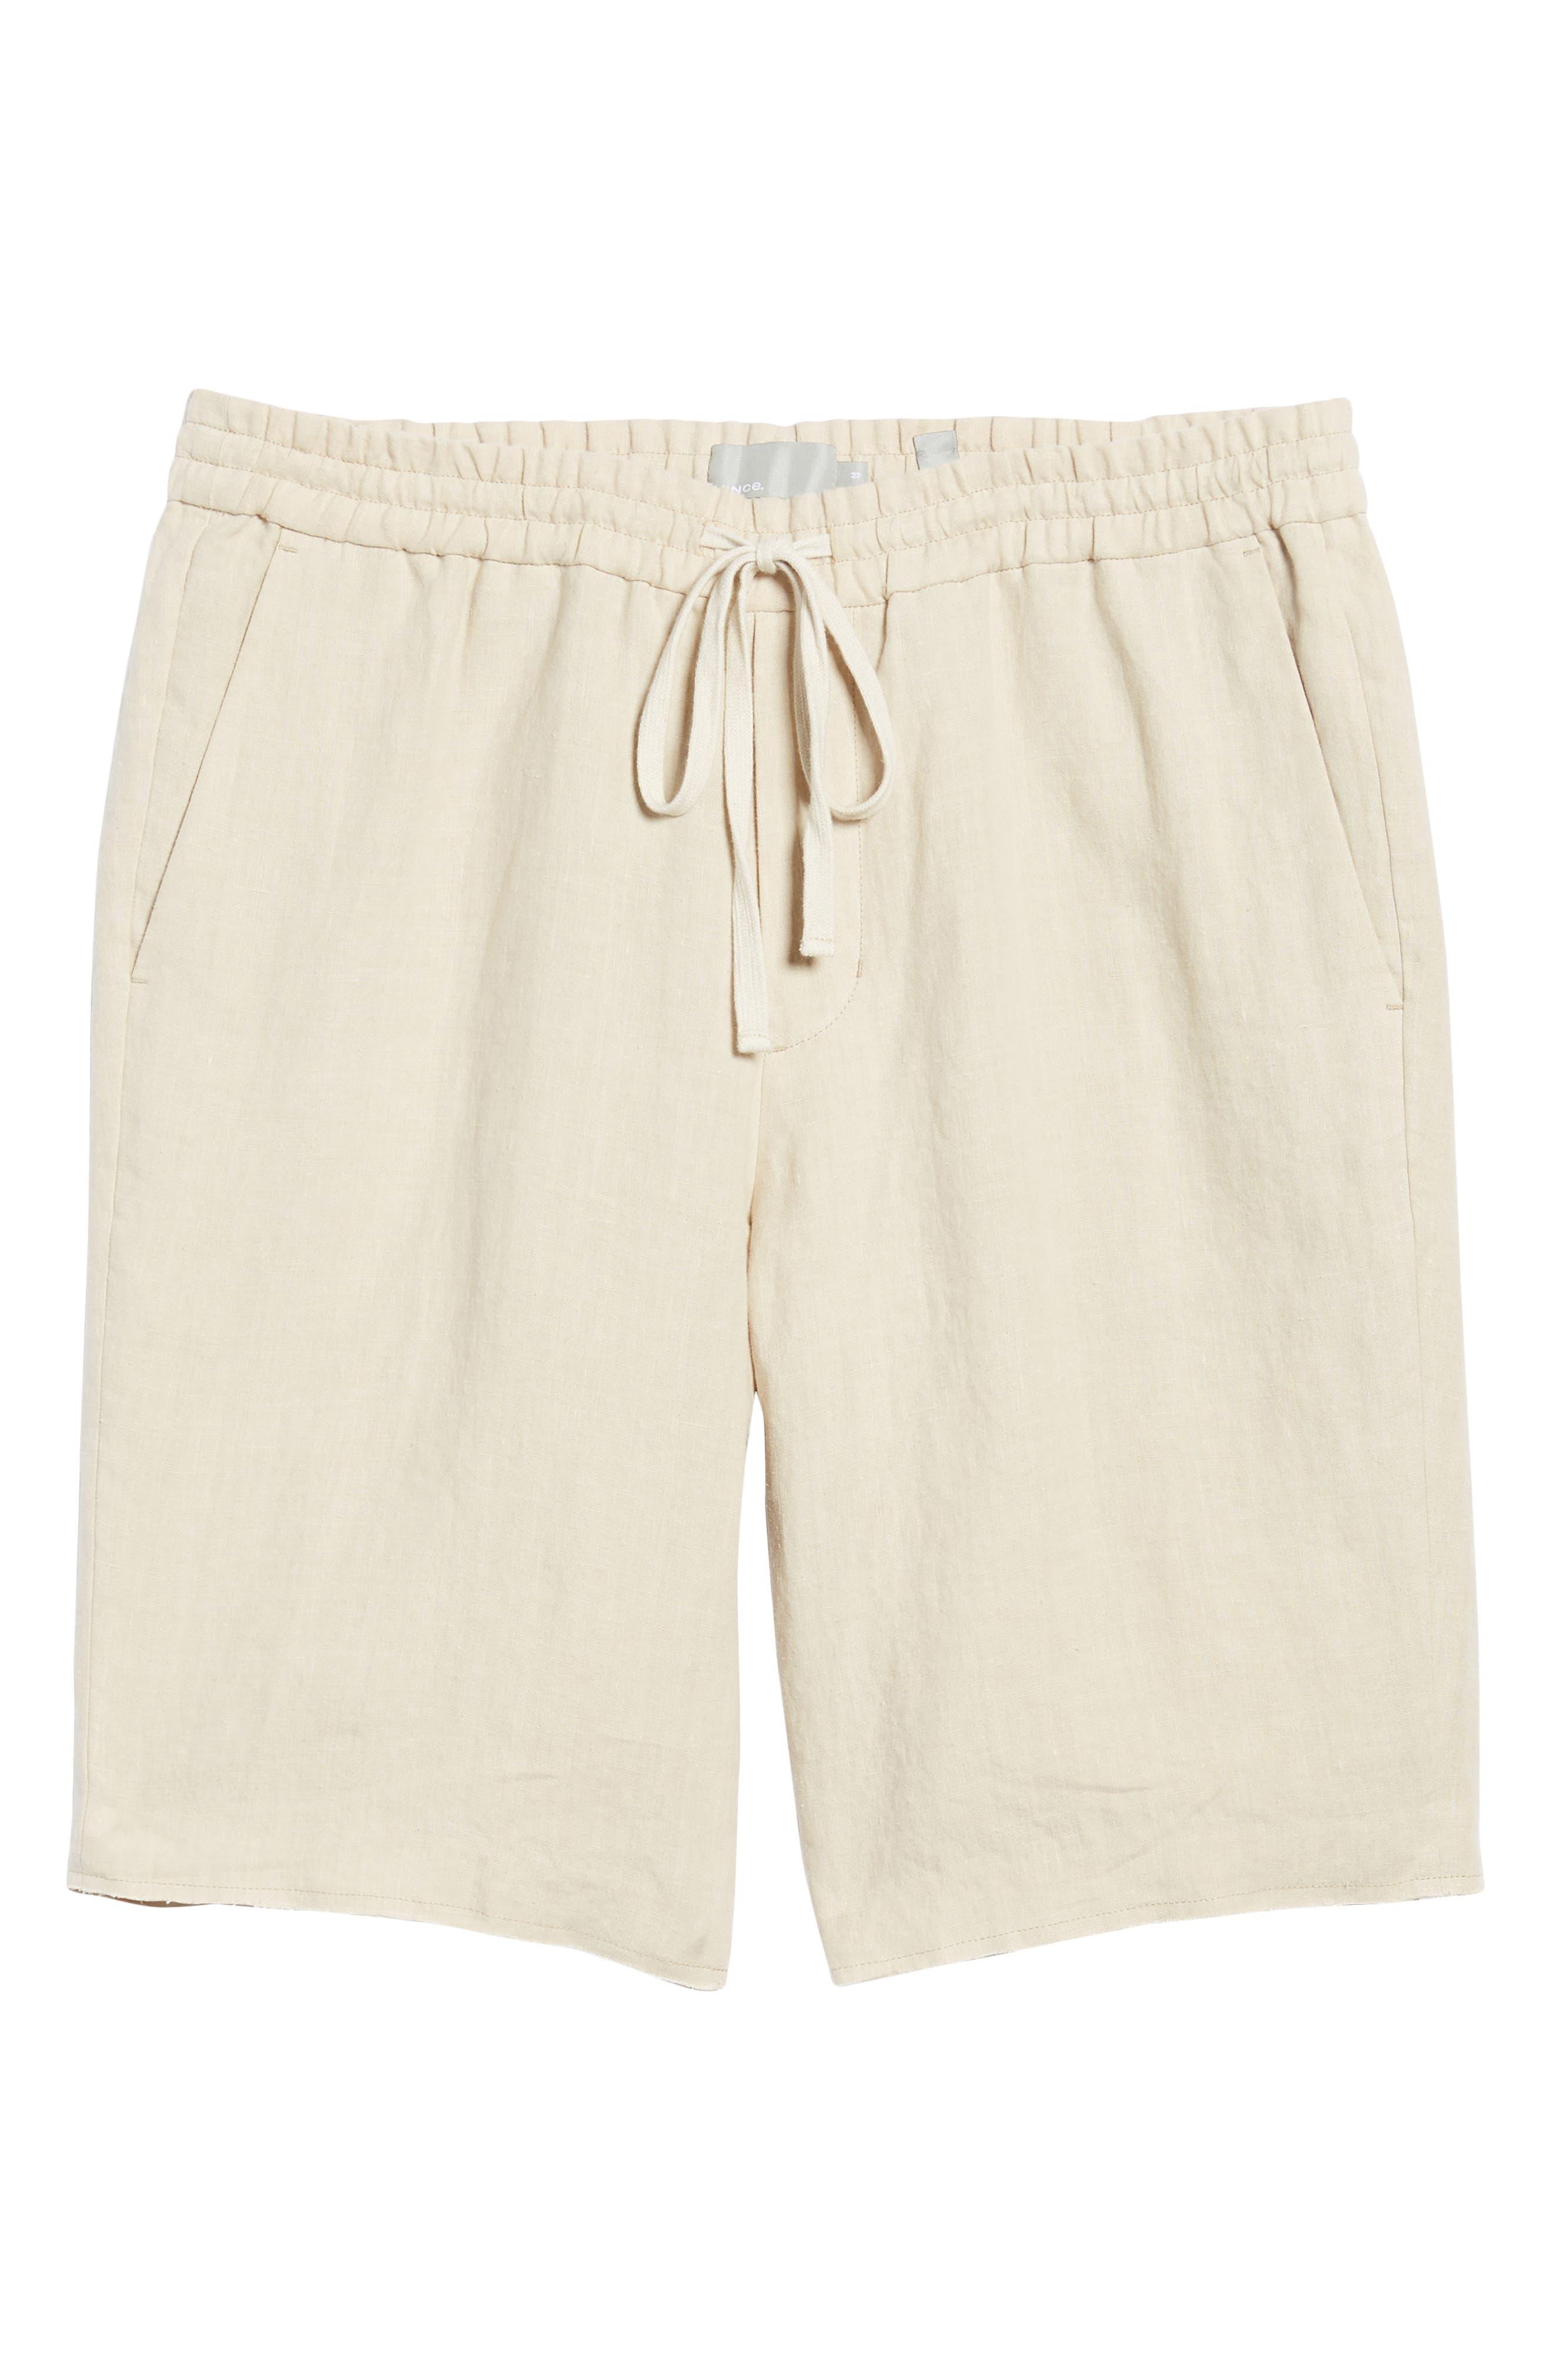 Raw Hem Slim Fit Track Shorts,                             Alternate thumbnail 6, color,                             White Sand